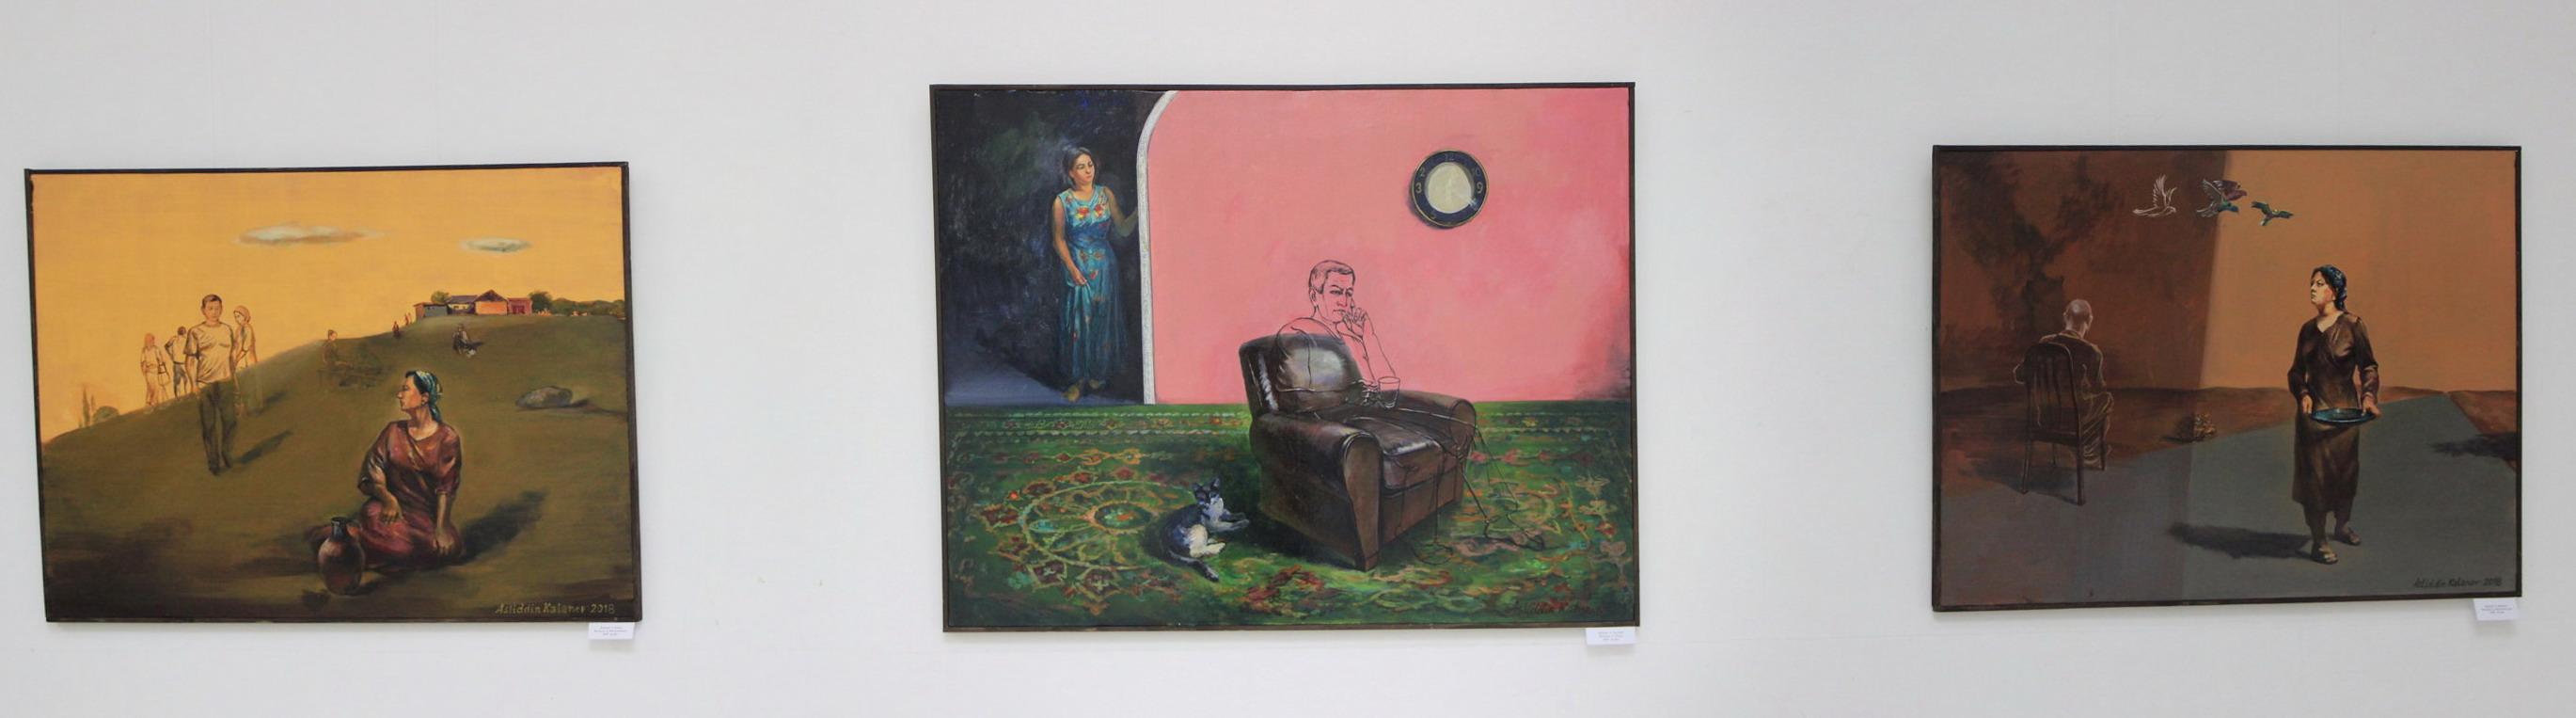 Экспозиция картин А. Каланова